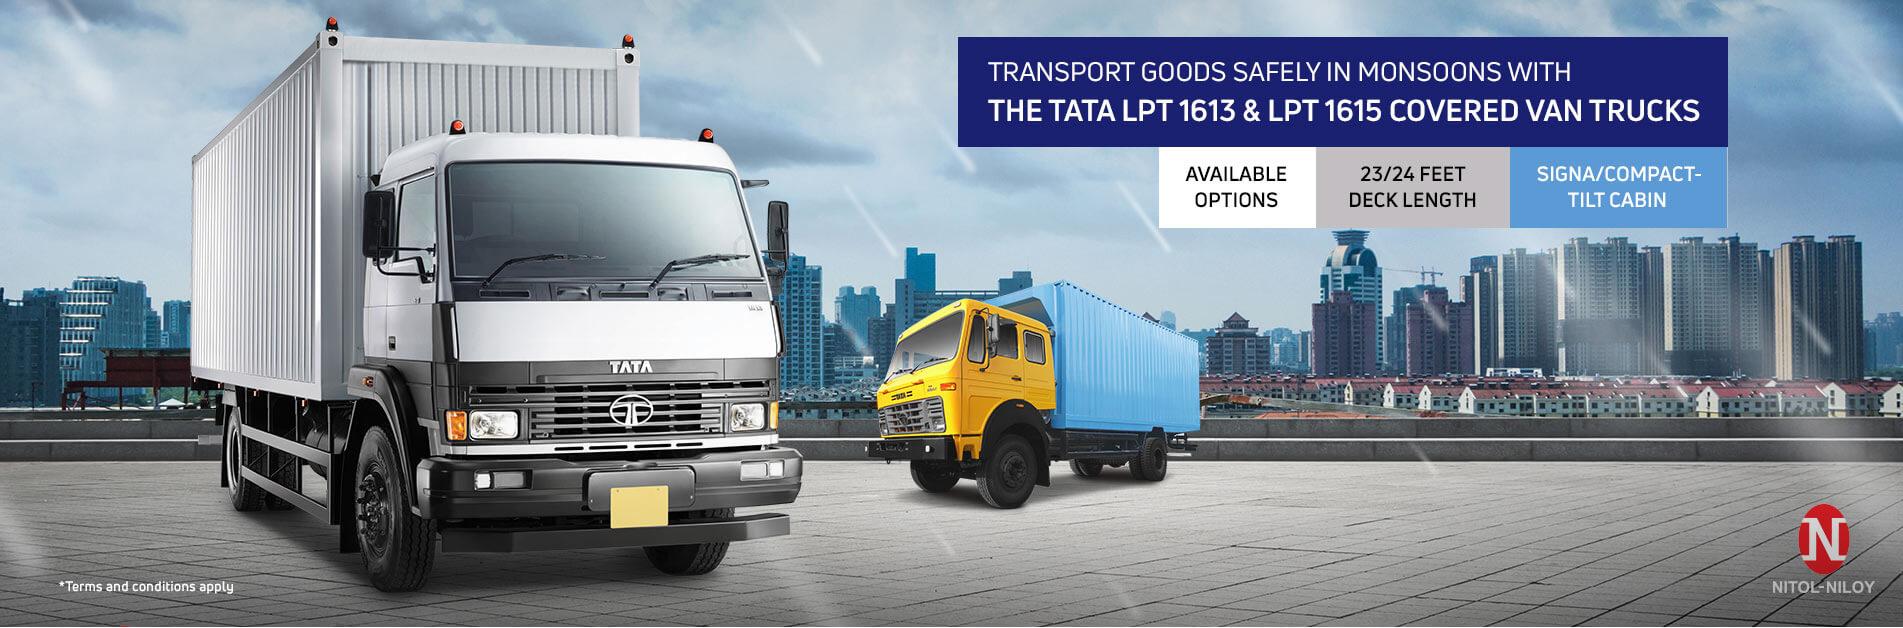 Tata LPT 1613 & LPT 1615 Covered Van Cargo Trucks